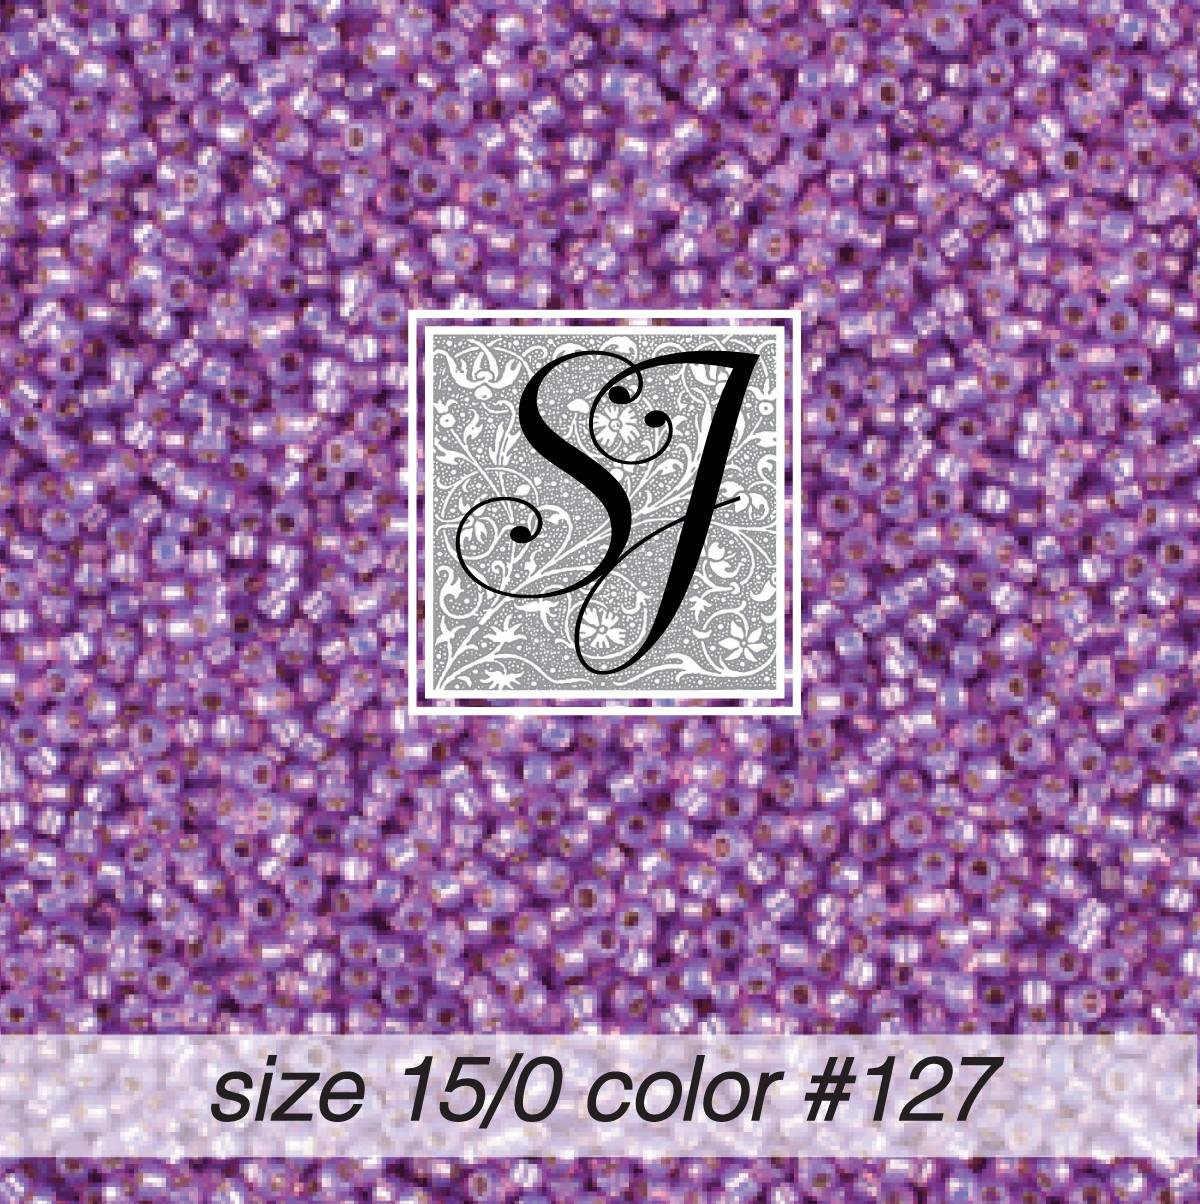 127 Parma Violet Alabaster S/L 15/0 Seed Bead